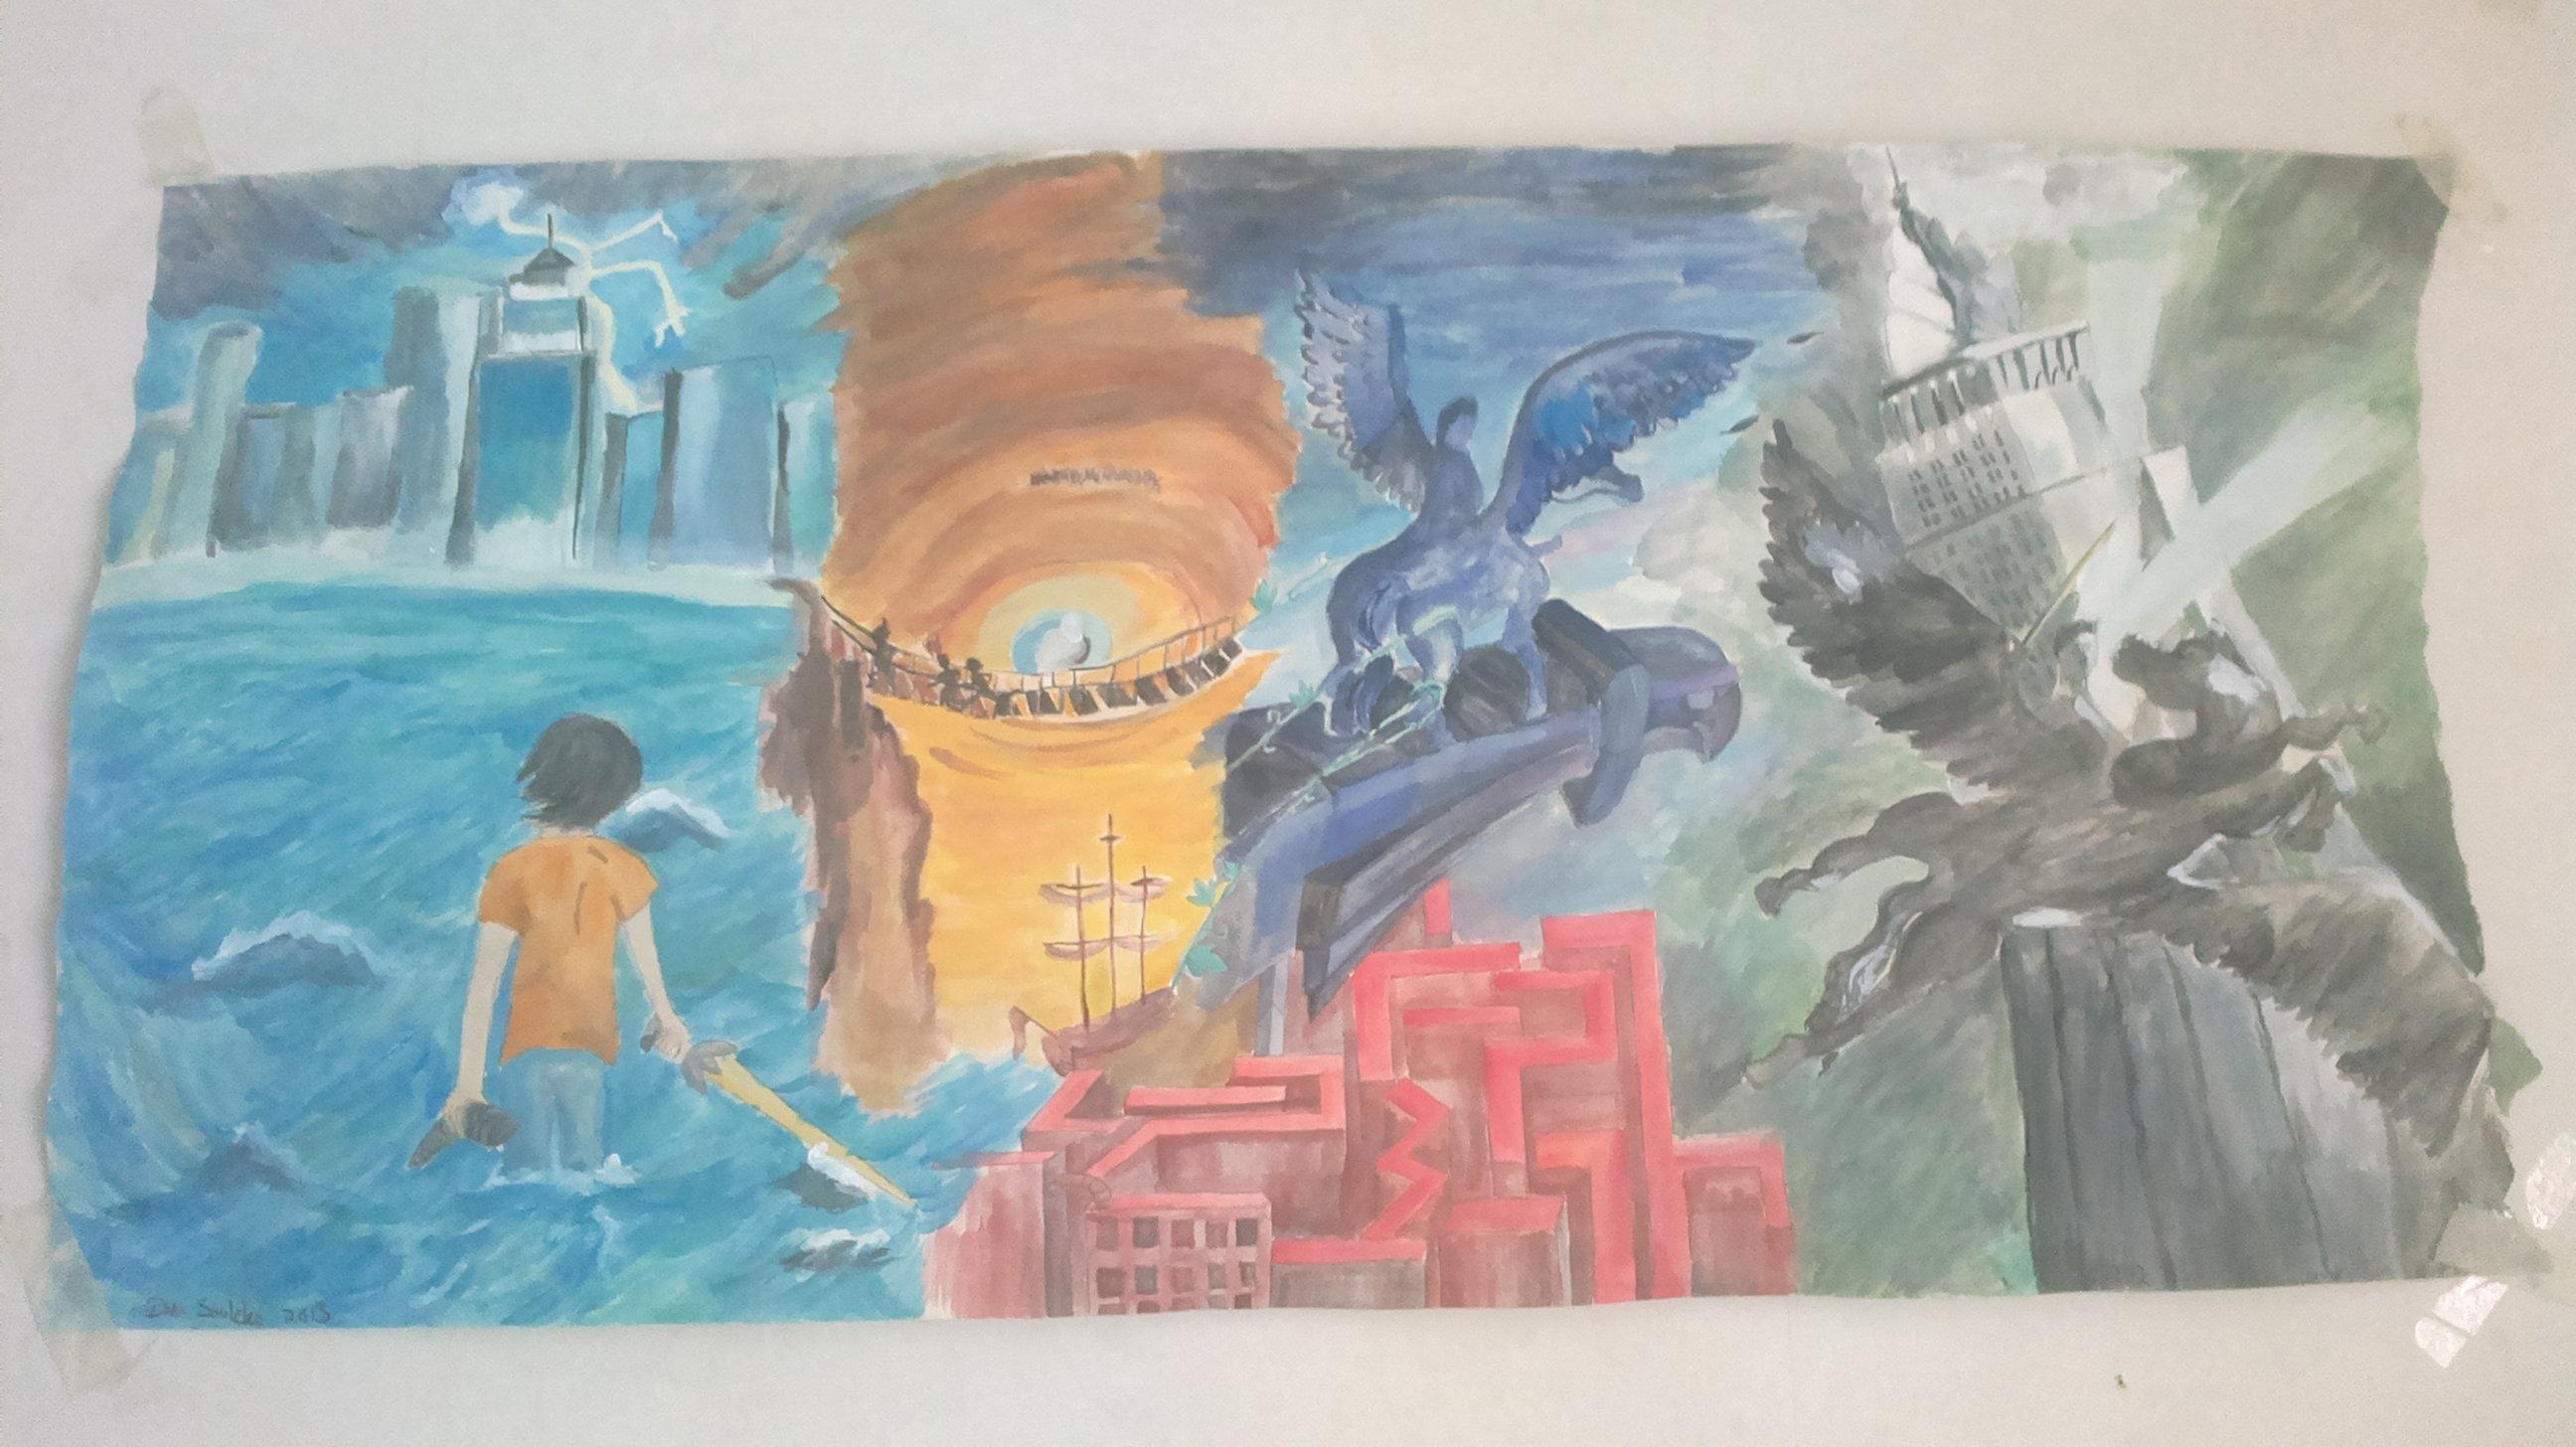 Percy Jackson Tyson Tumblr Wallpapers